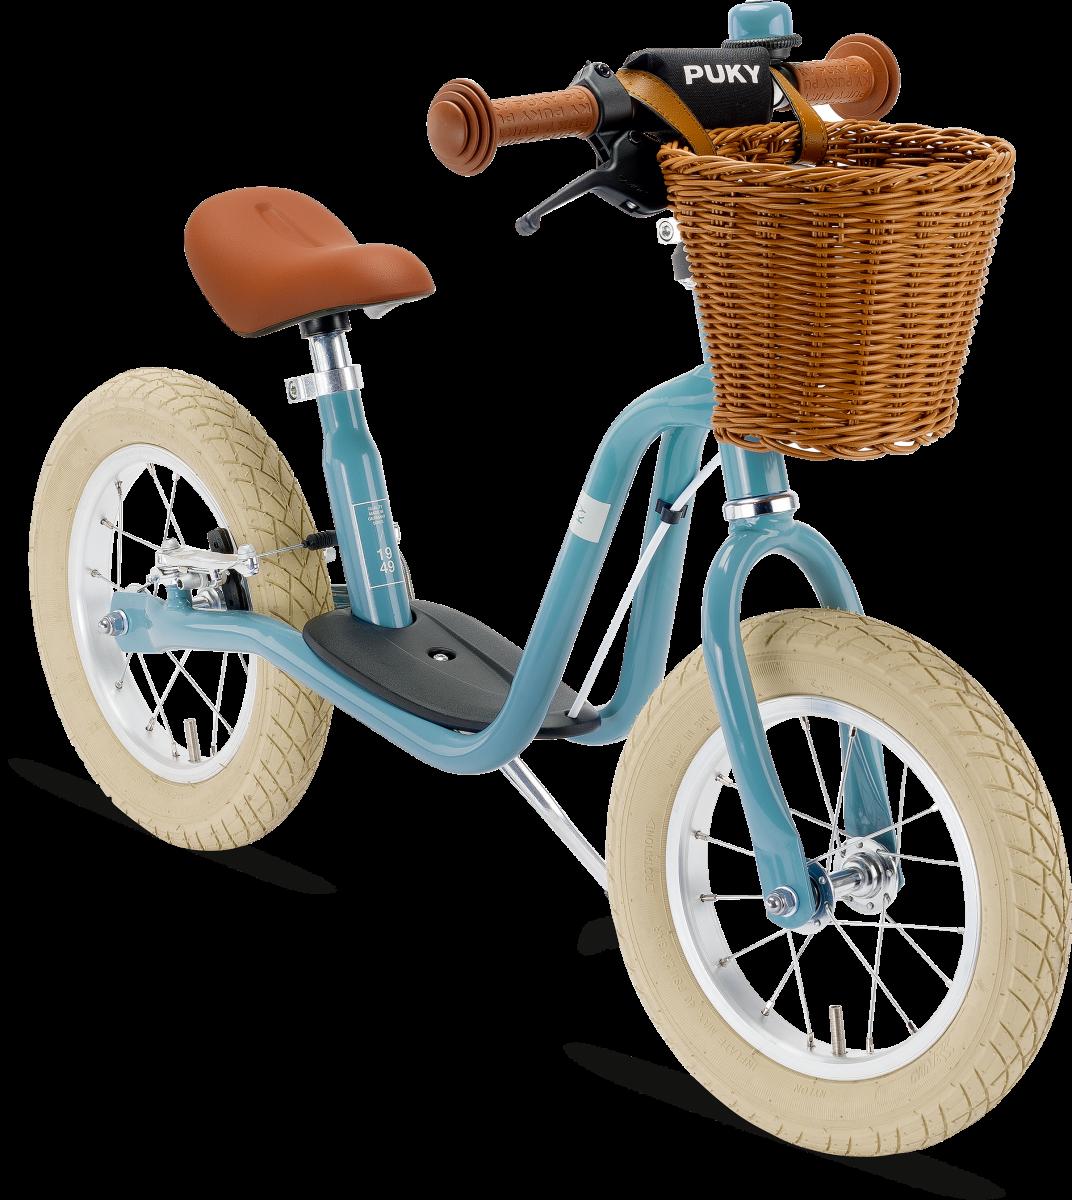 Puky LR XL BR CLASSIC Løbecykel - Blå